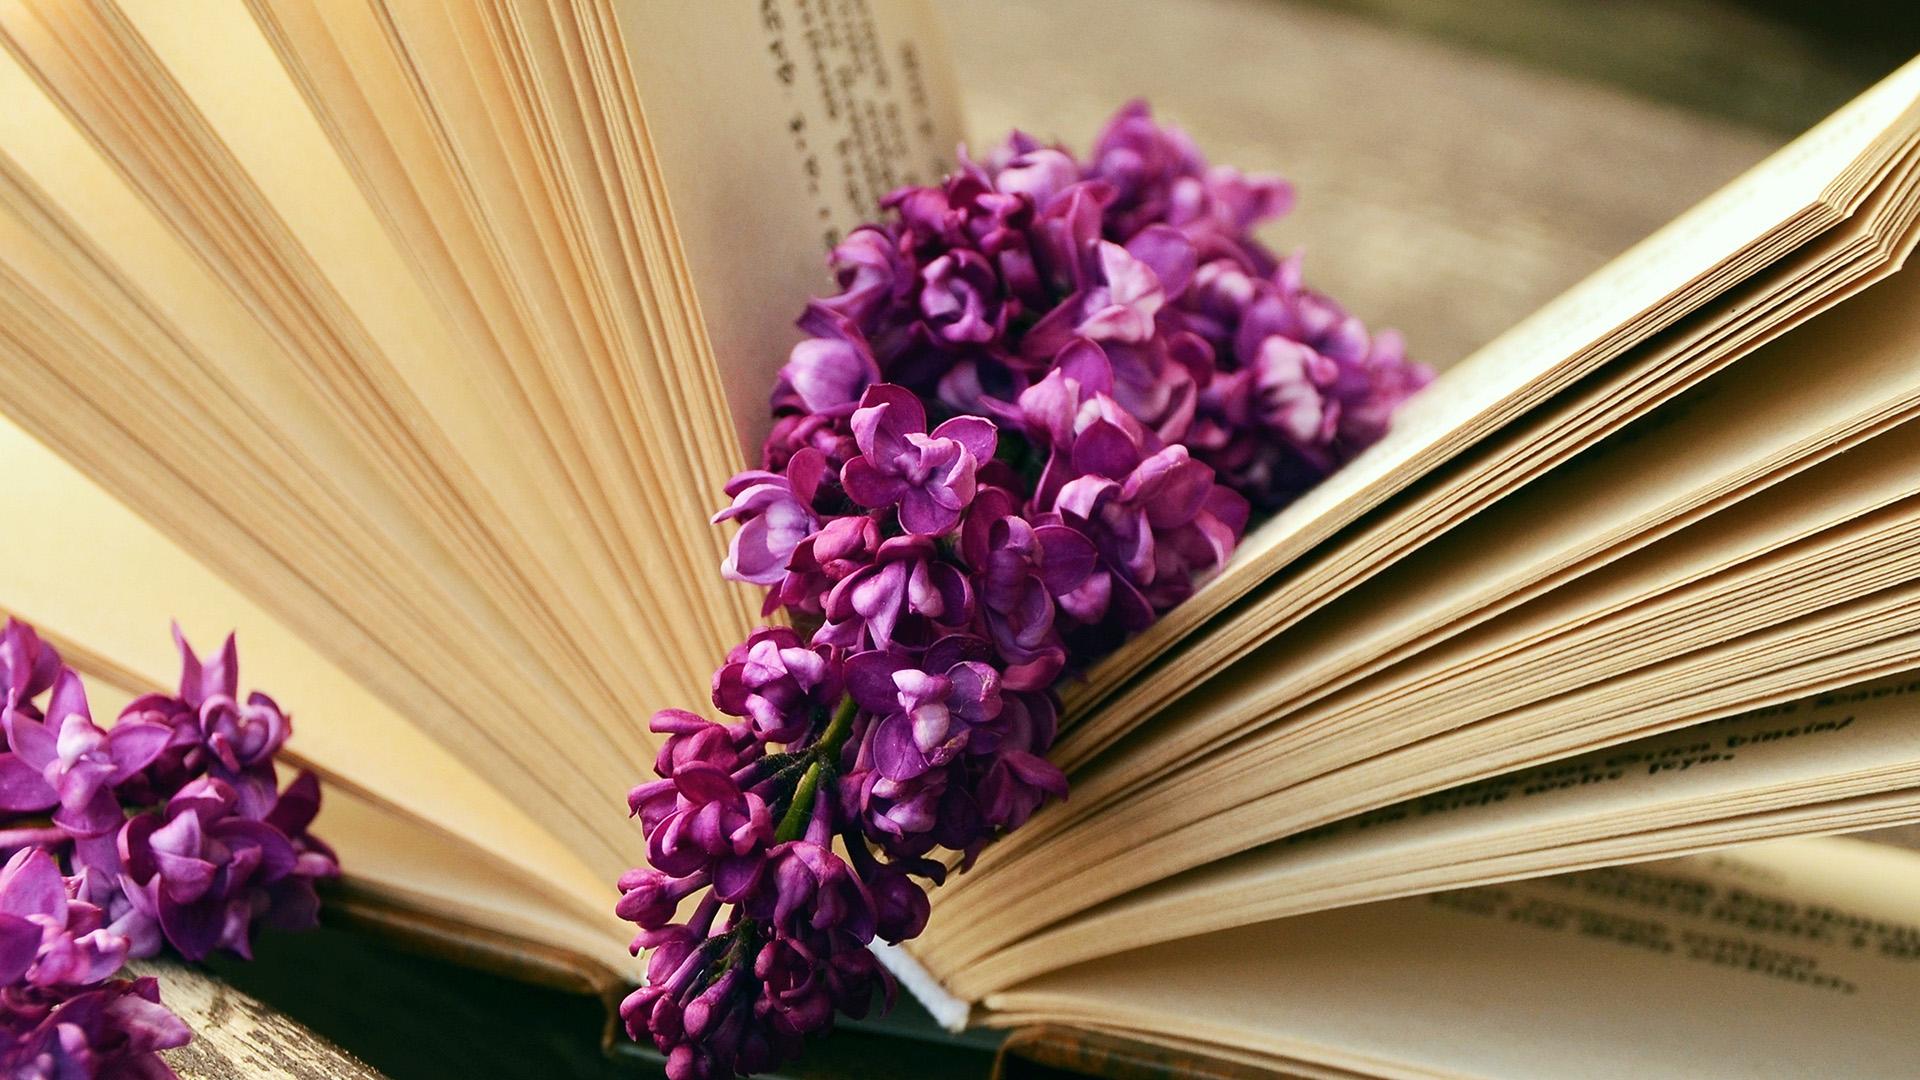 ni22-book-read-time-flower-wallpaper